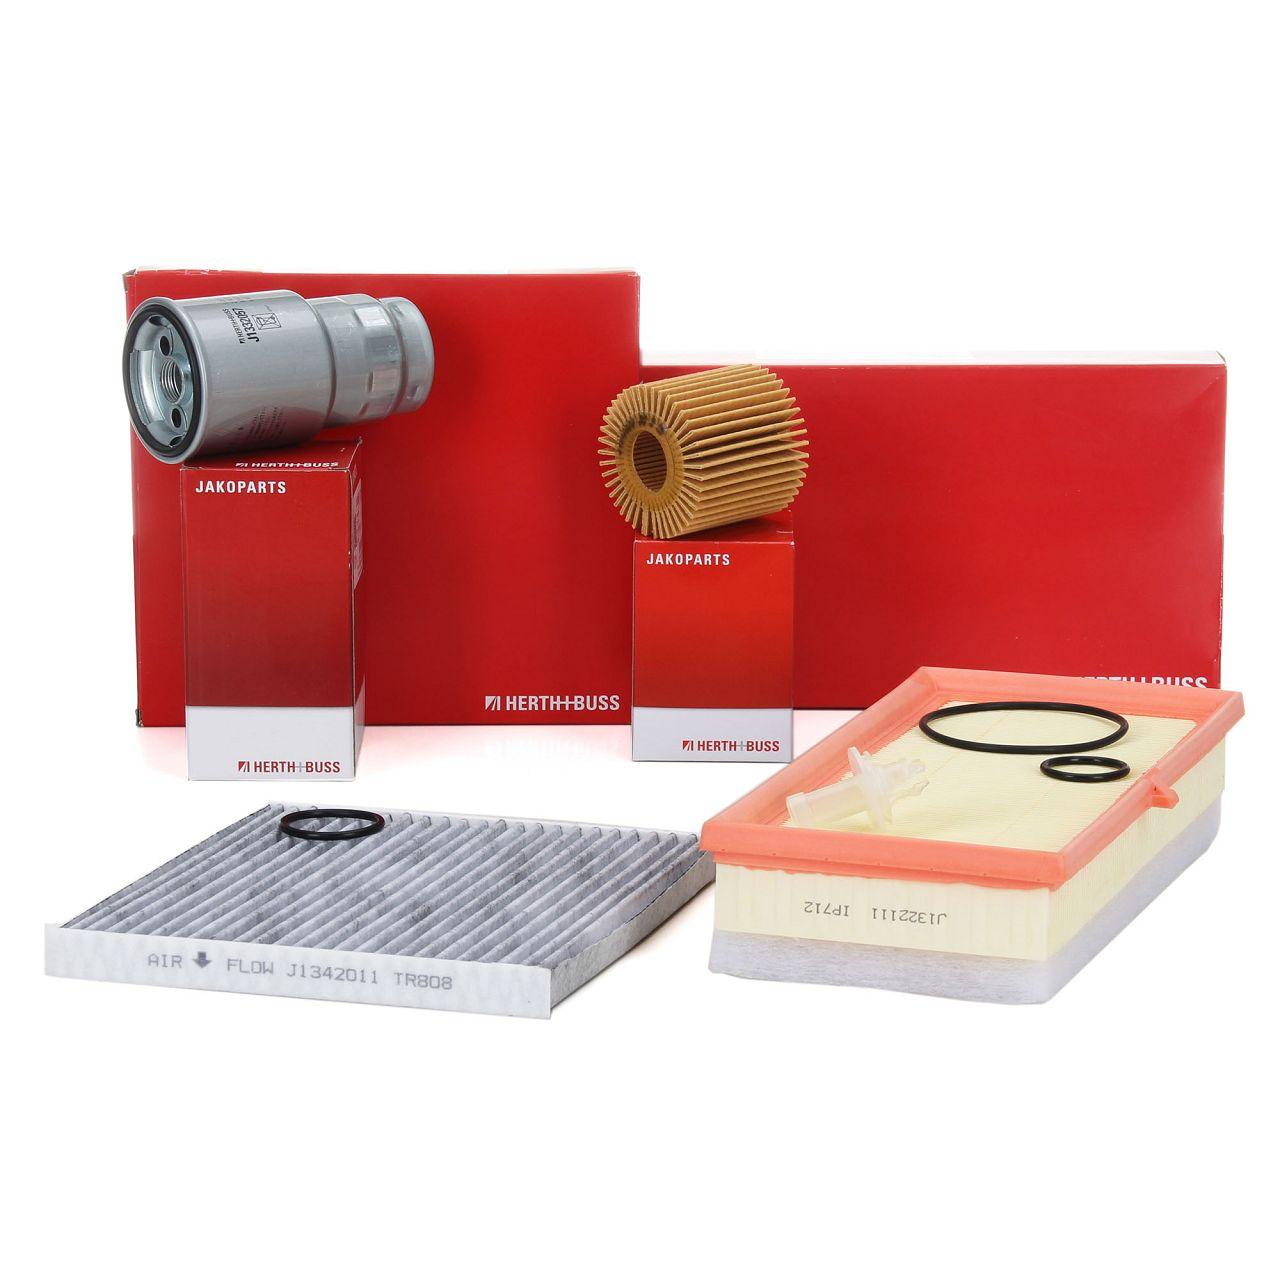 HERTH+BUSS JAKOPARTS Inspektionskit Filterpaket für TOYOTA VERSO S 1.4D4-D 90 PS